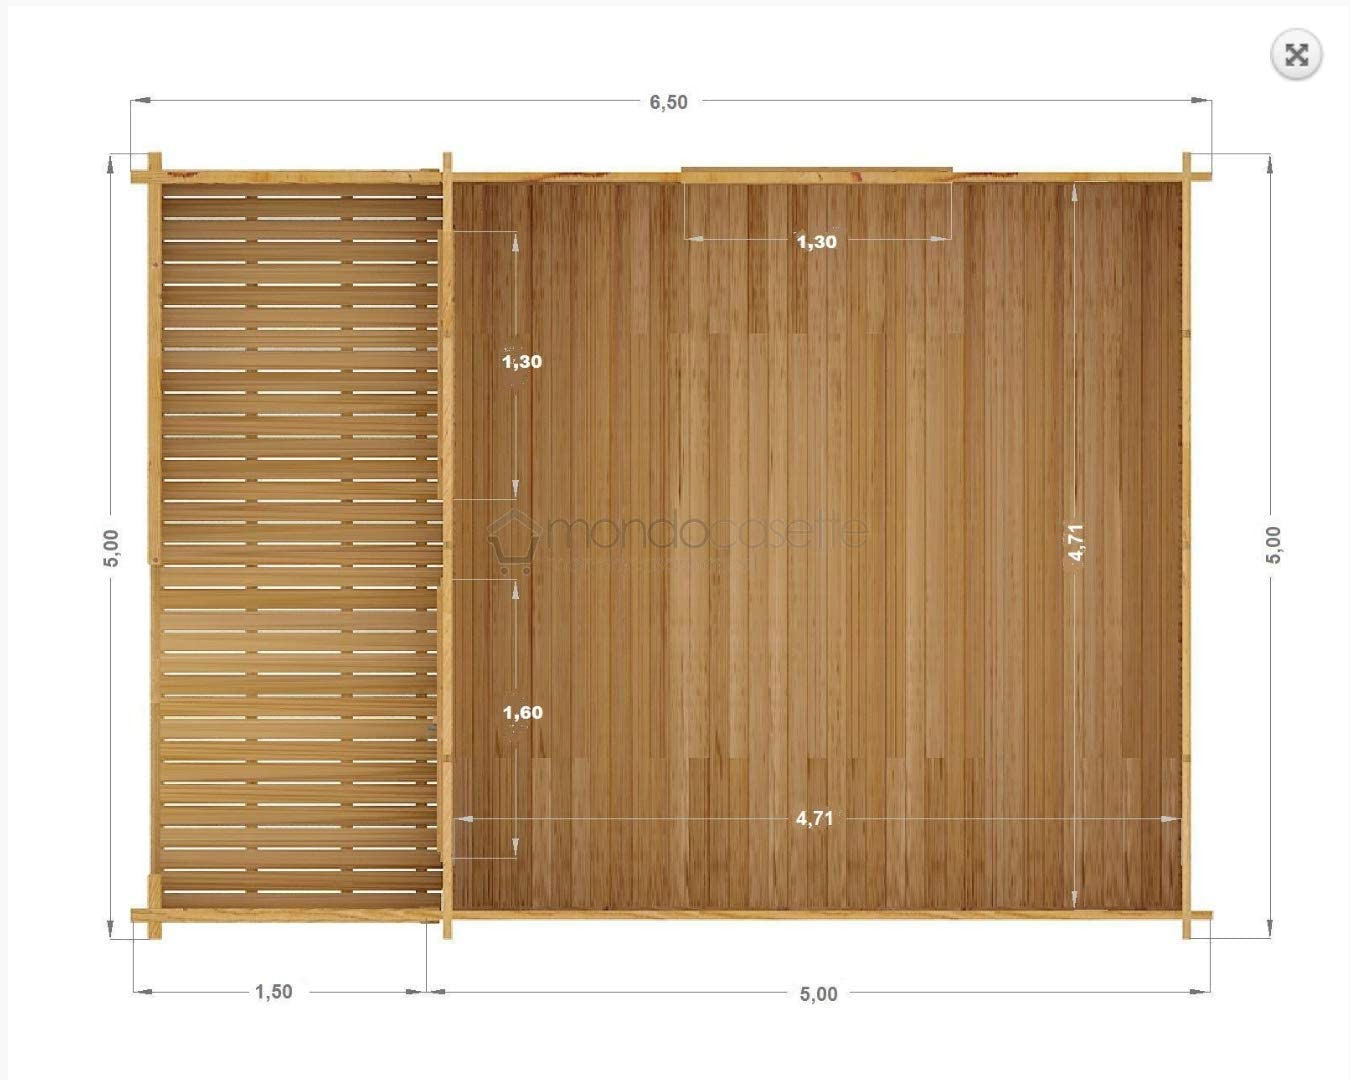 Mondocasette Casa Casa de Madera de jardín – Modelo Venta Grosor de Paredes 45 mm 500 x 500 cm, Bungalow Chalet Box: Amazon.es: Jardín